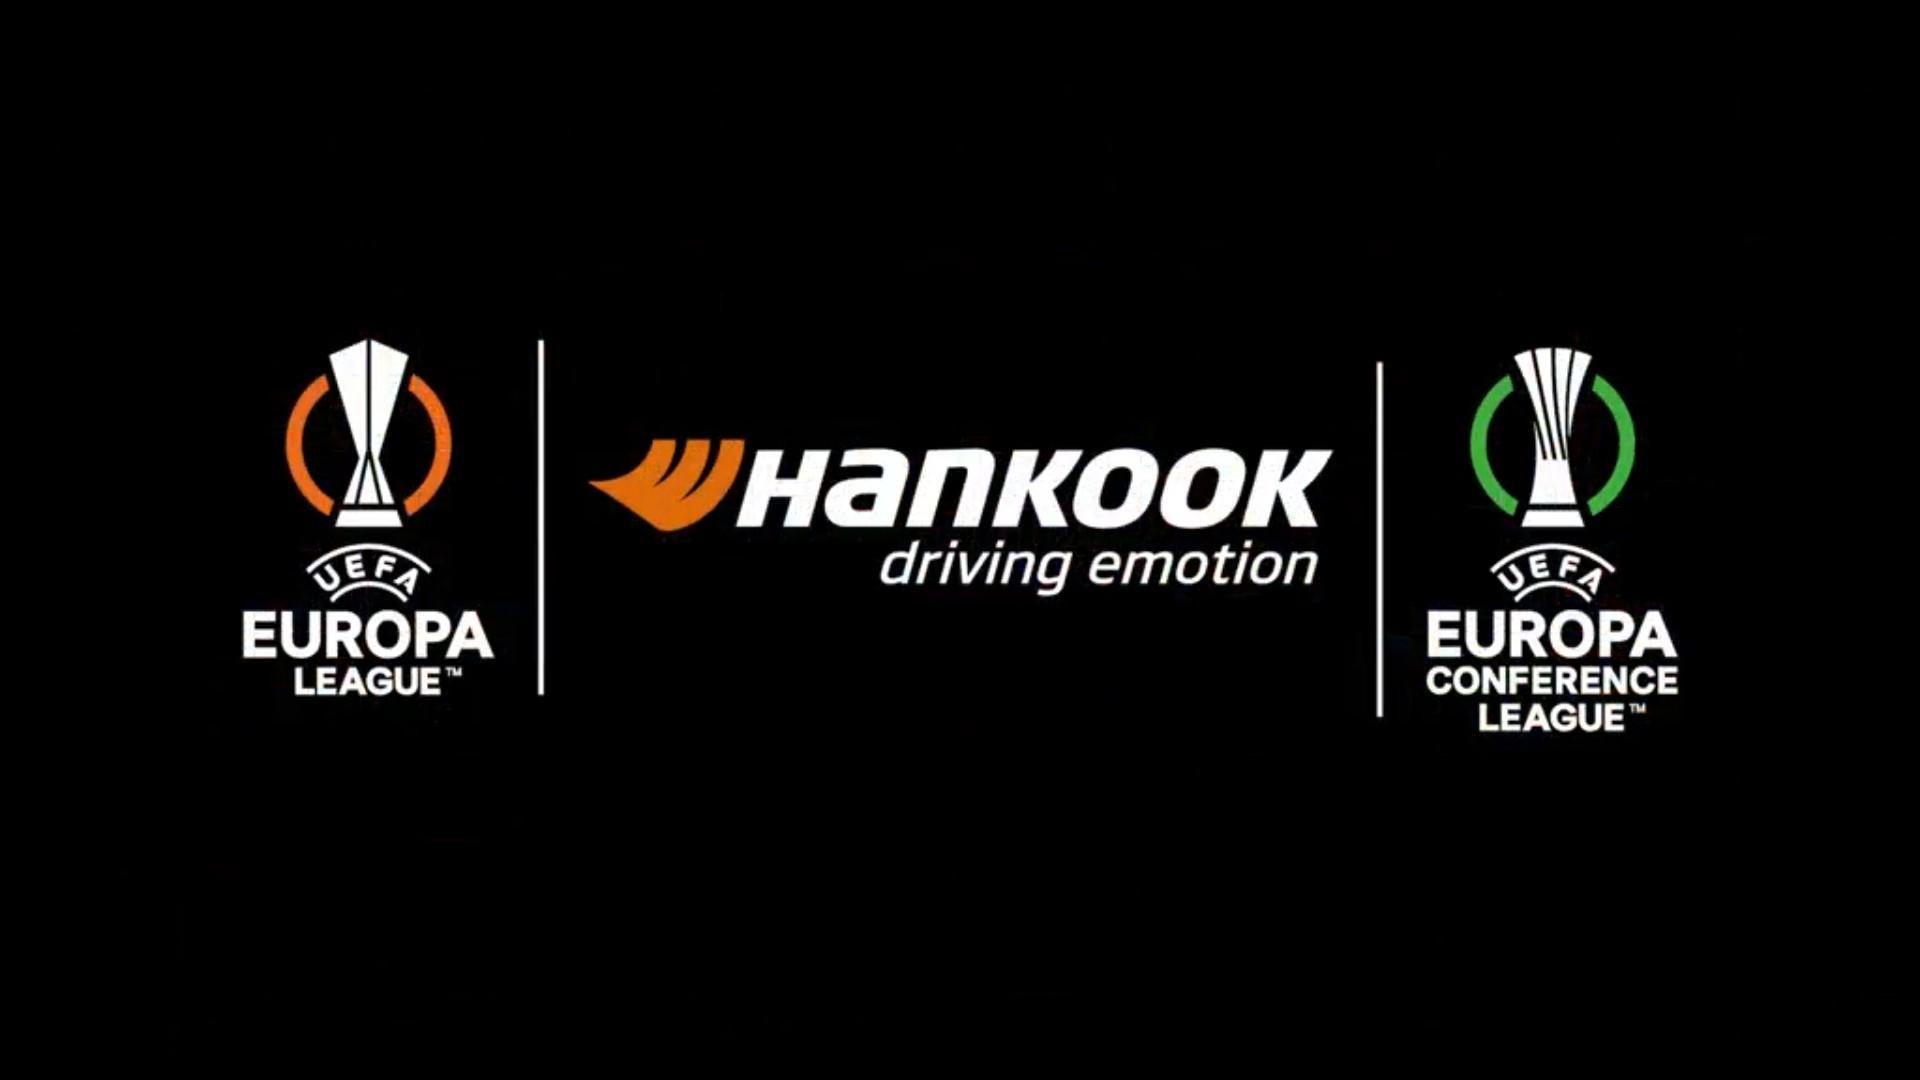 Hankook x UEFA (1) (football) 2021